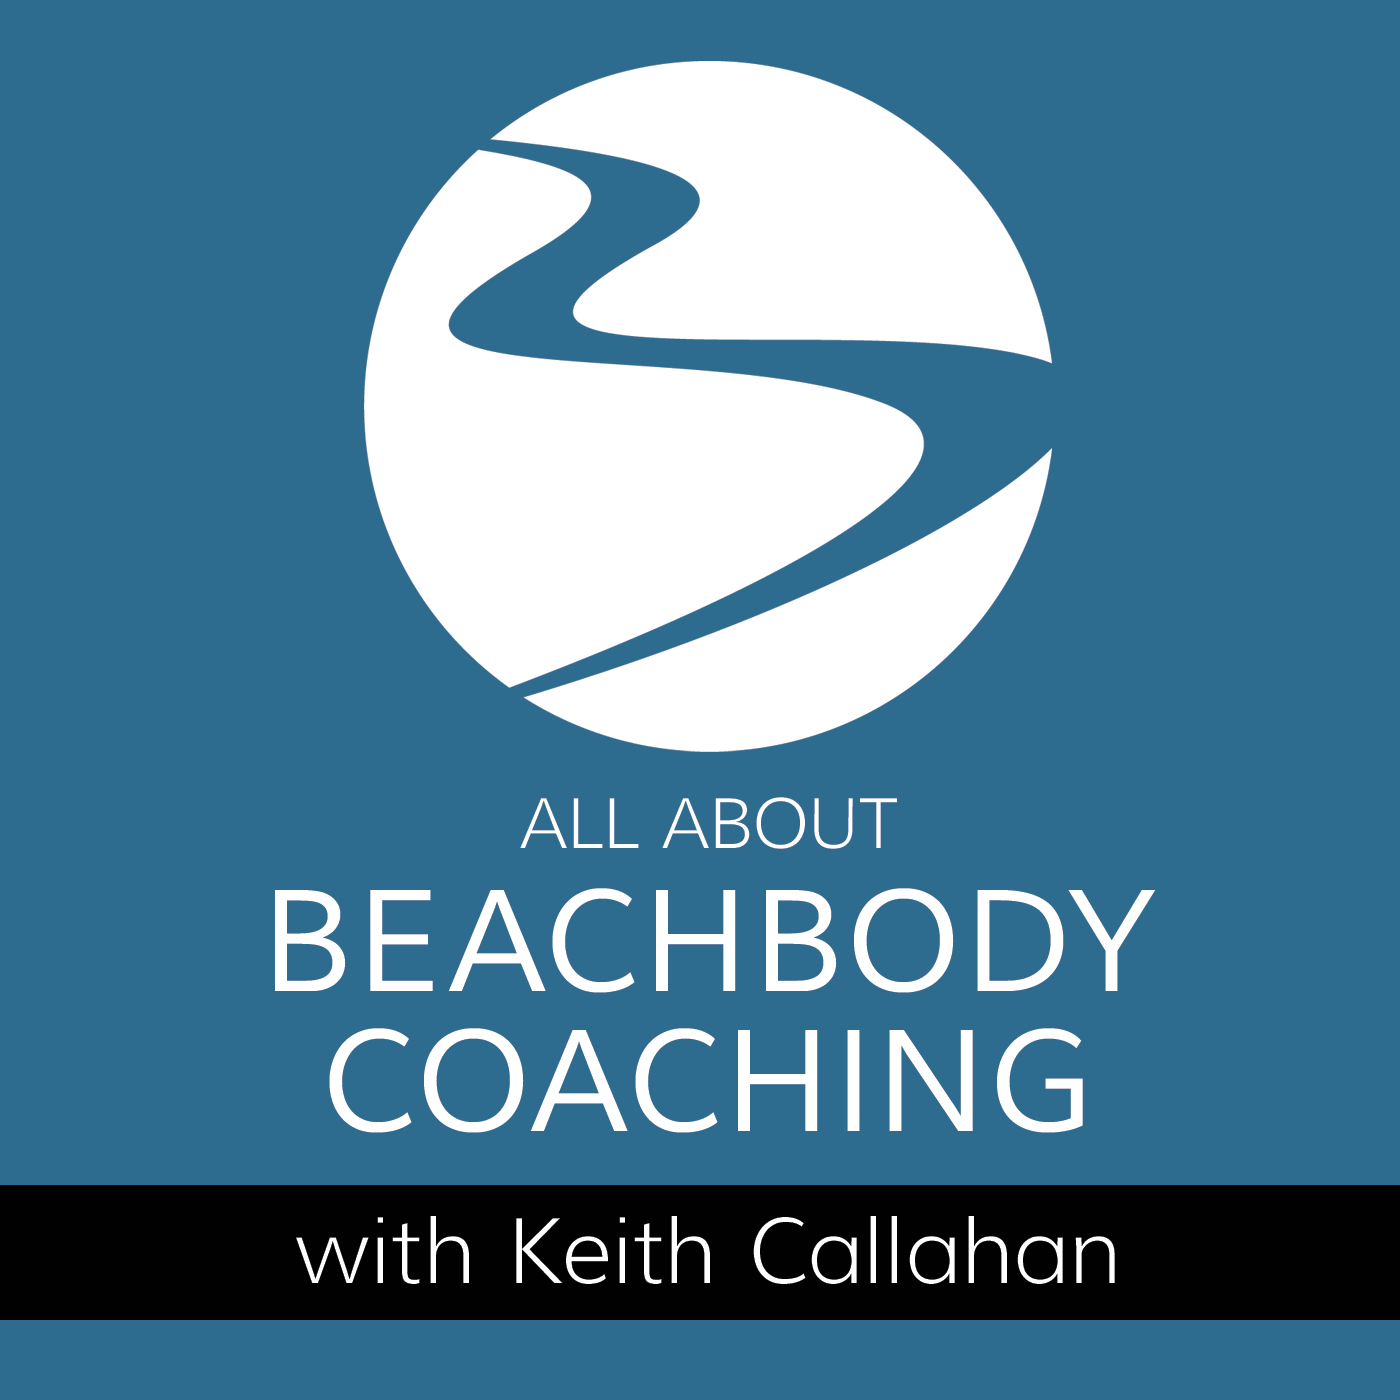 All About Beachbody Coaching